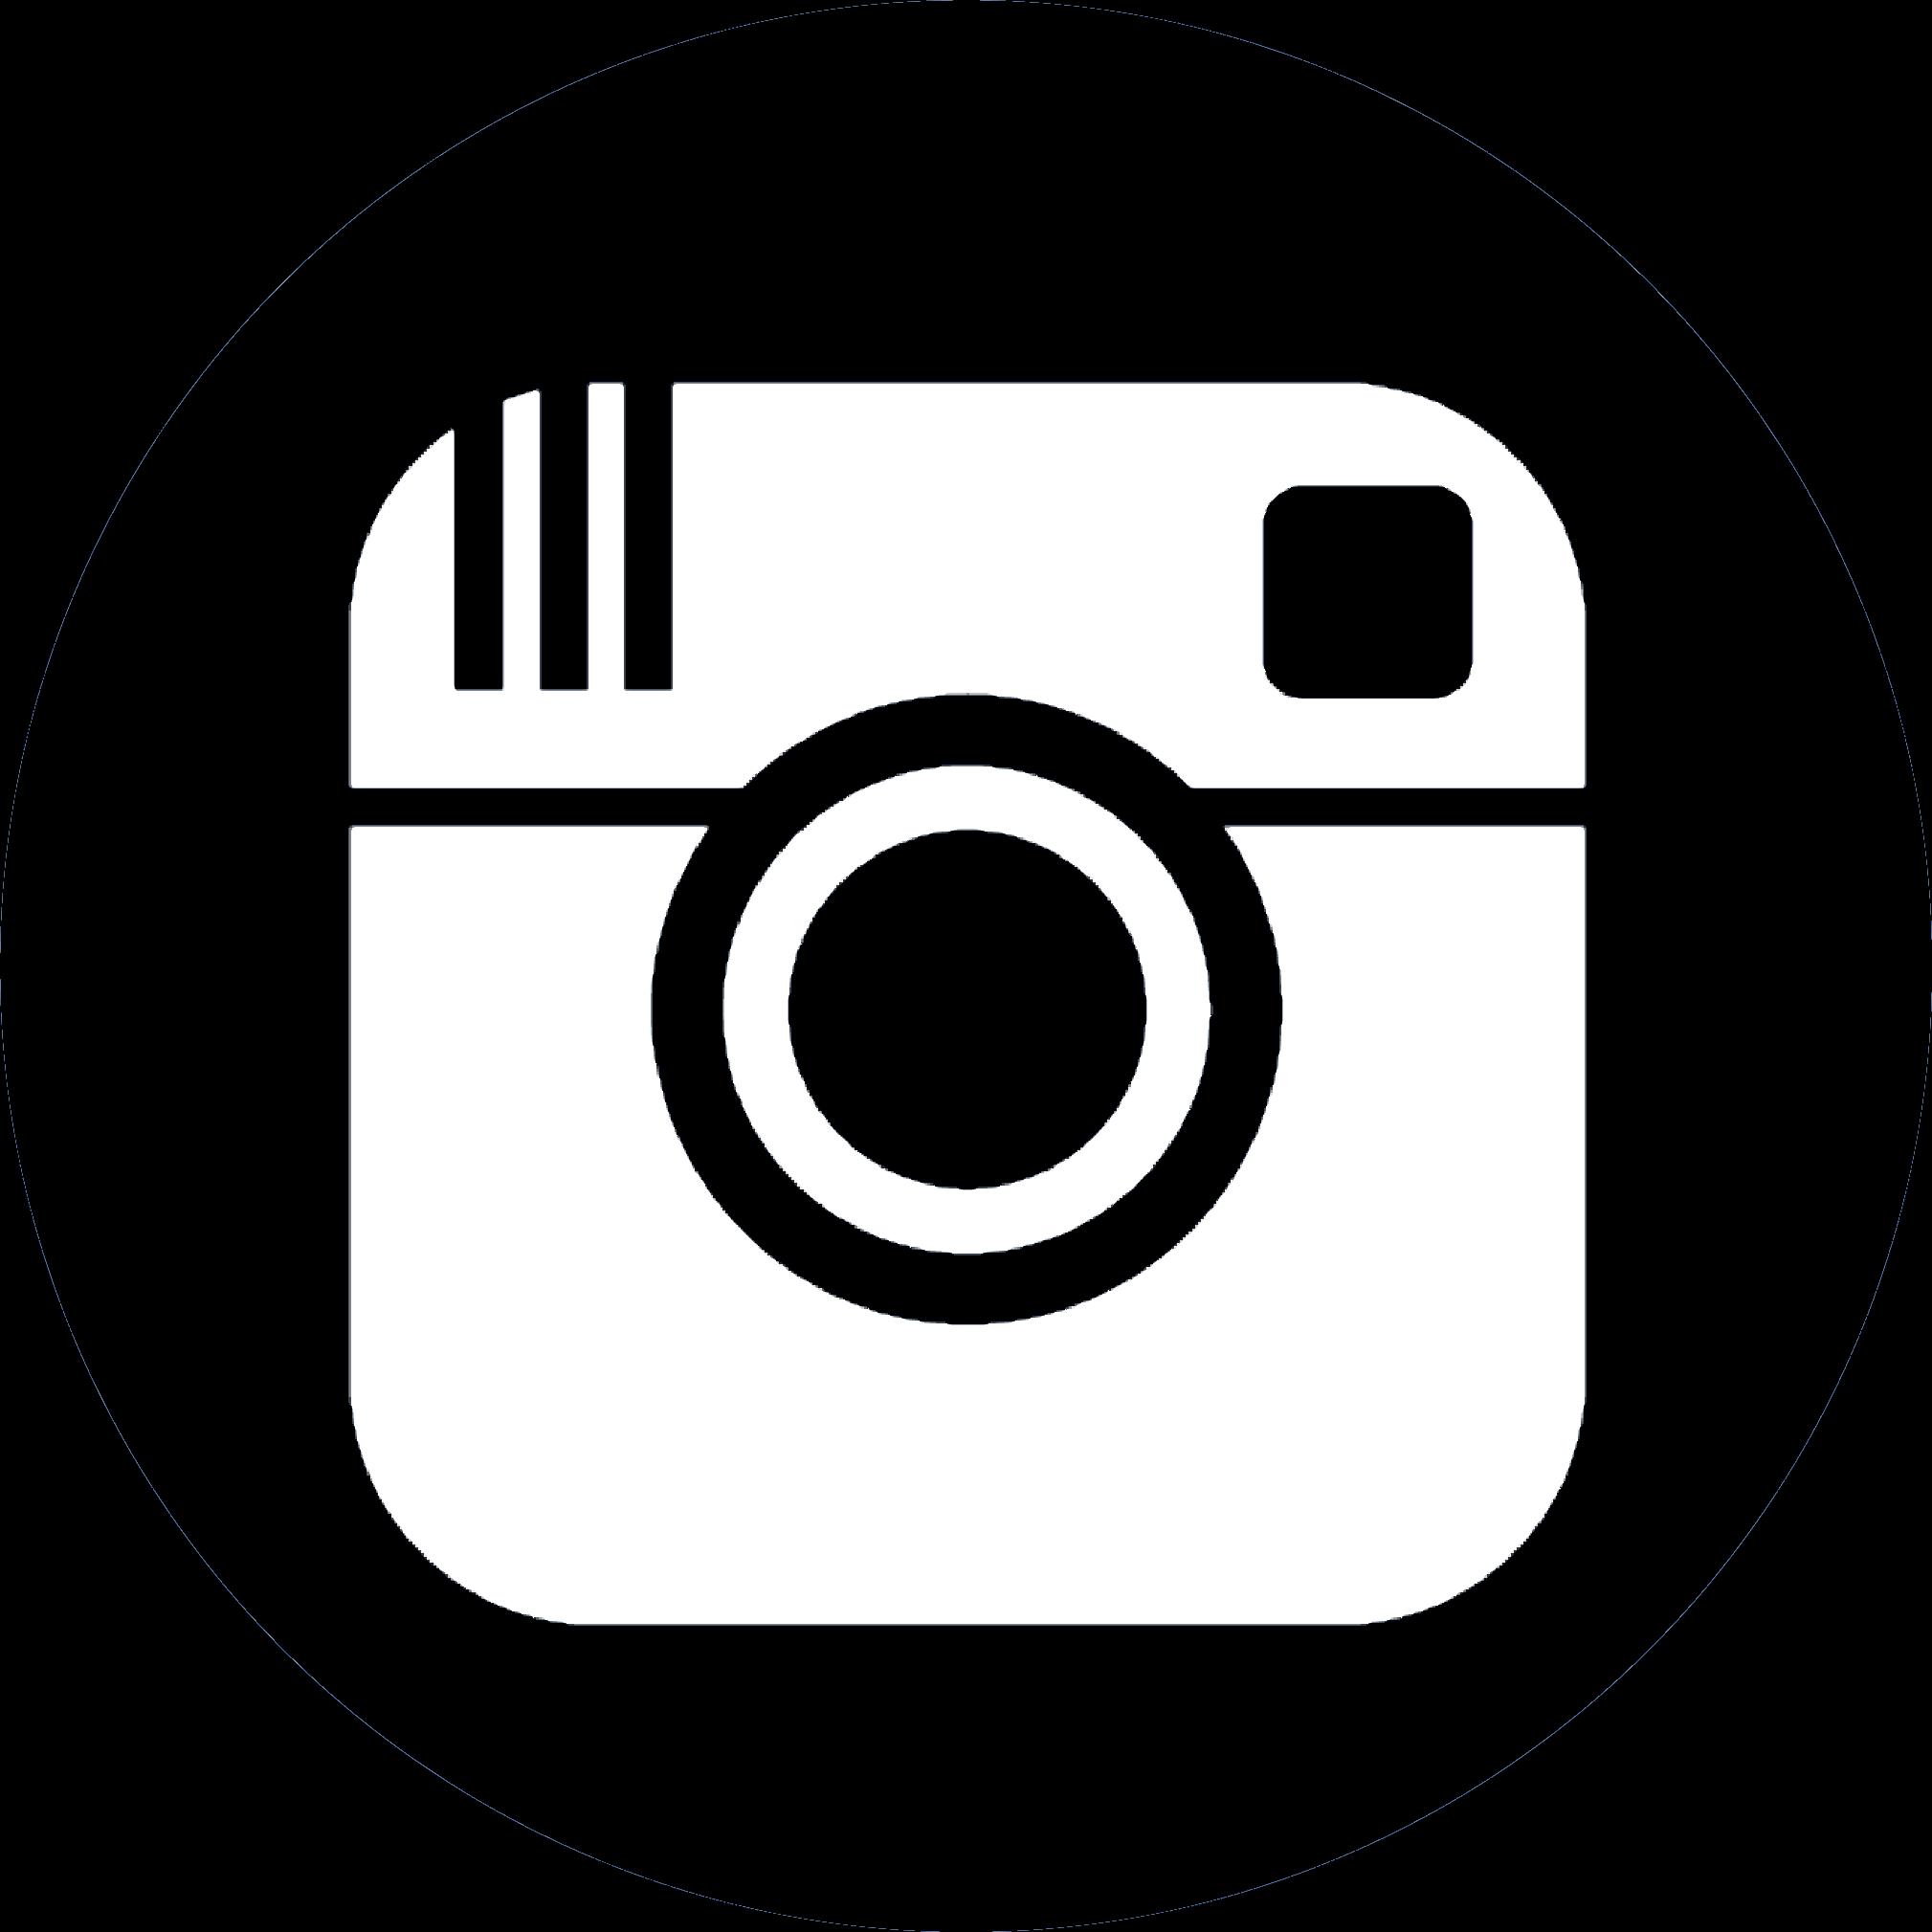 logo instagram png noir